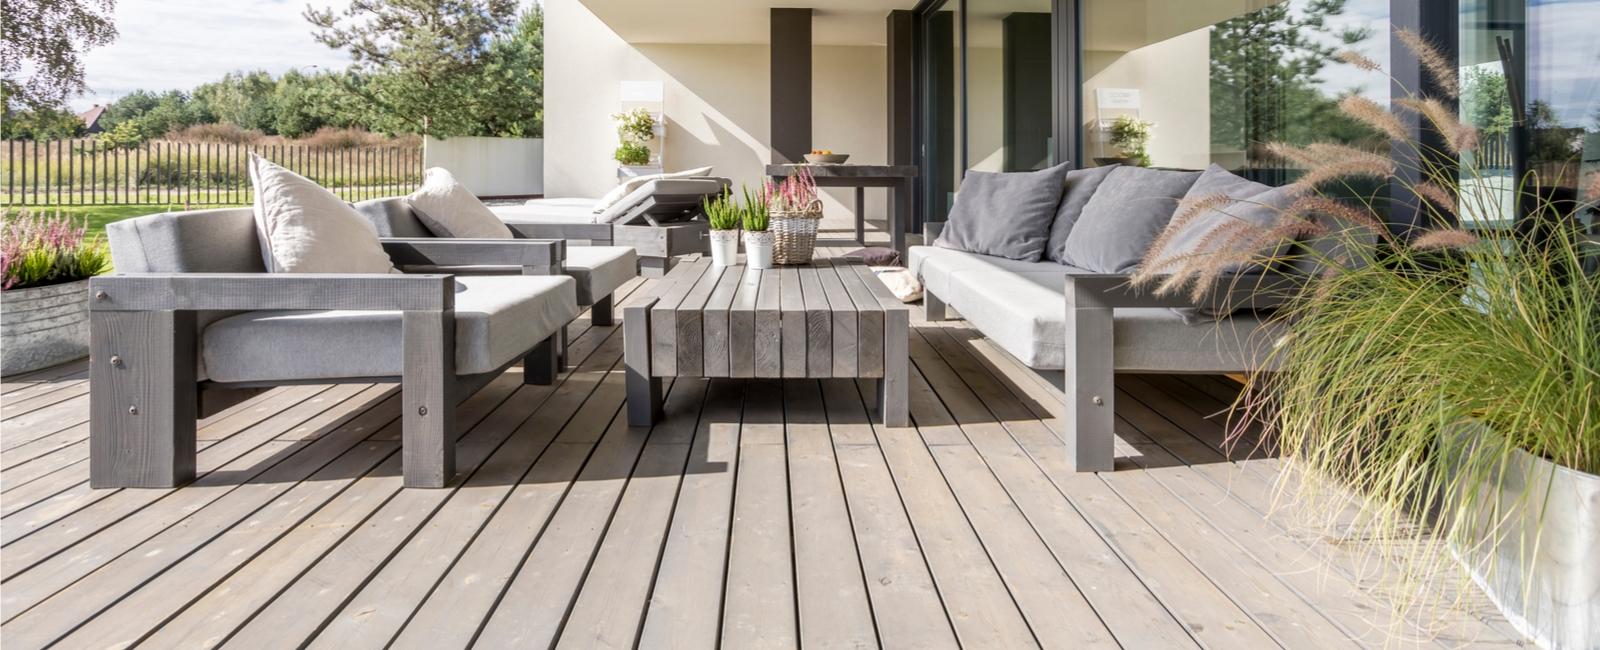 la terrasse classique conseils travaux. Black Bedroom Furniture Sets. Home Design Ideas